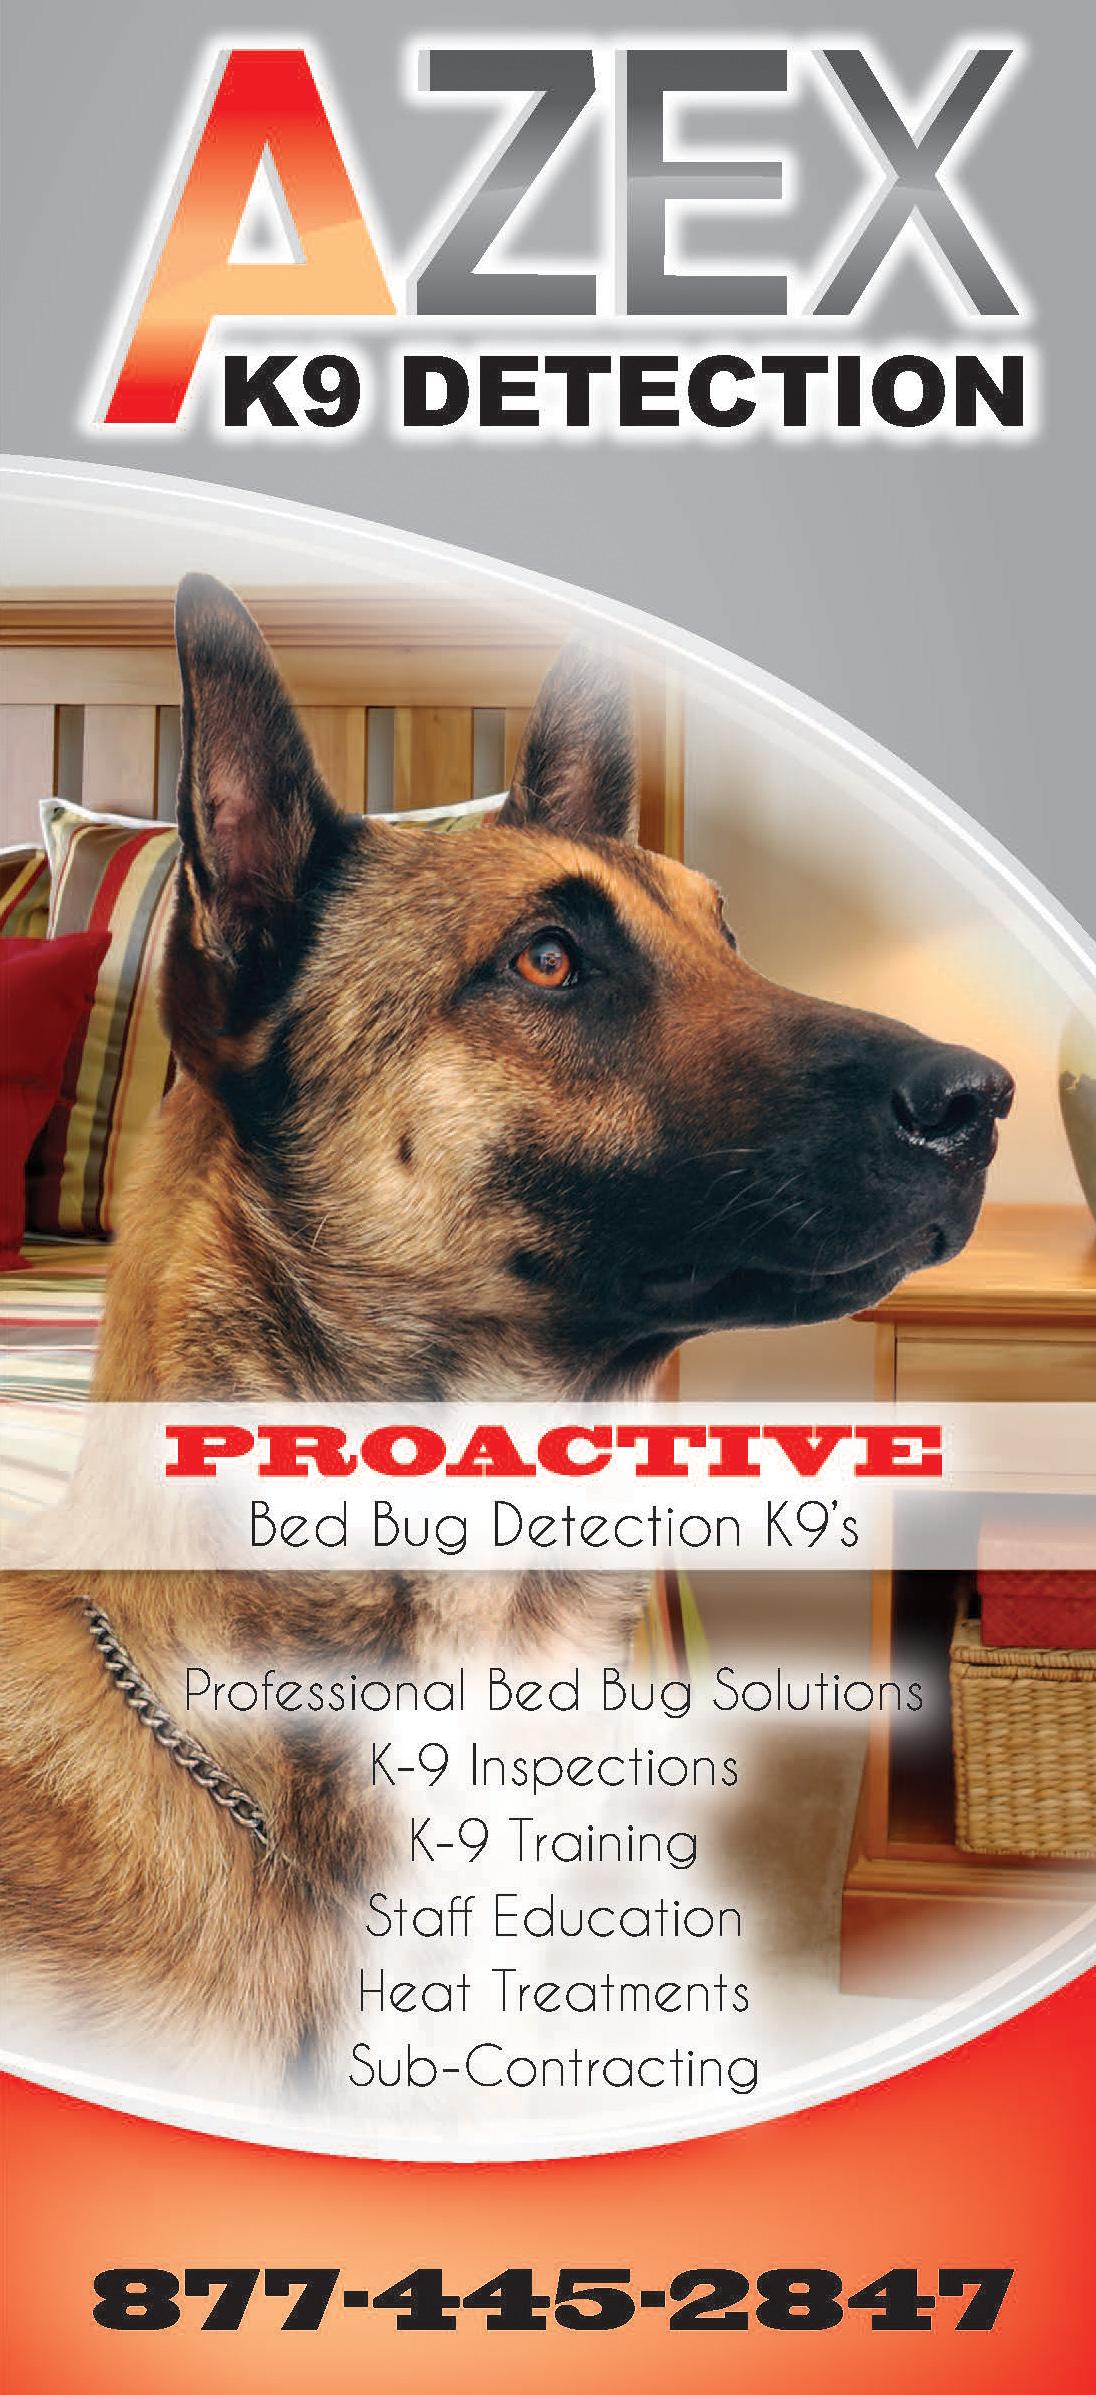 What do bed bugs look like k9 bug detectors - Bed Bug K9